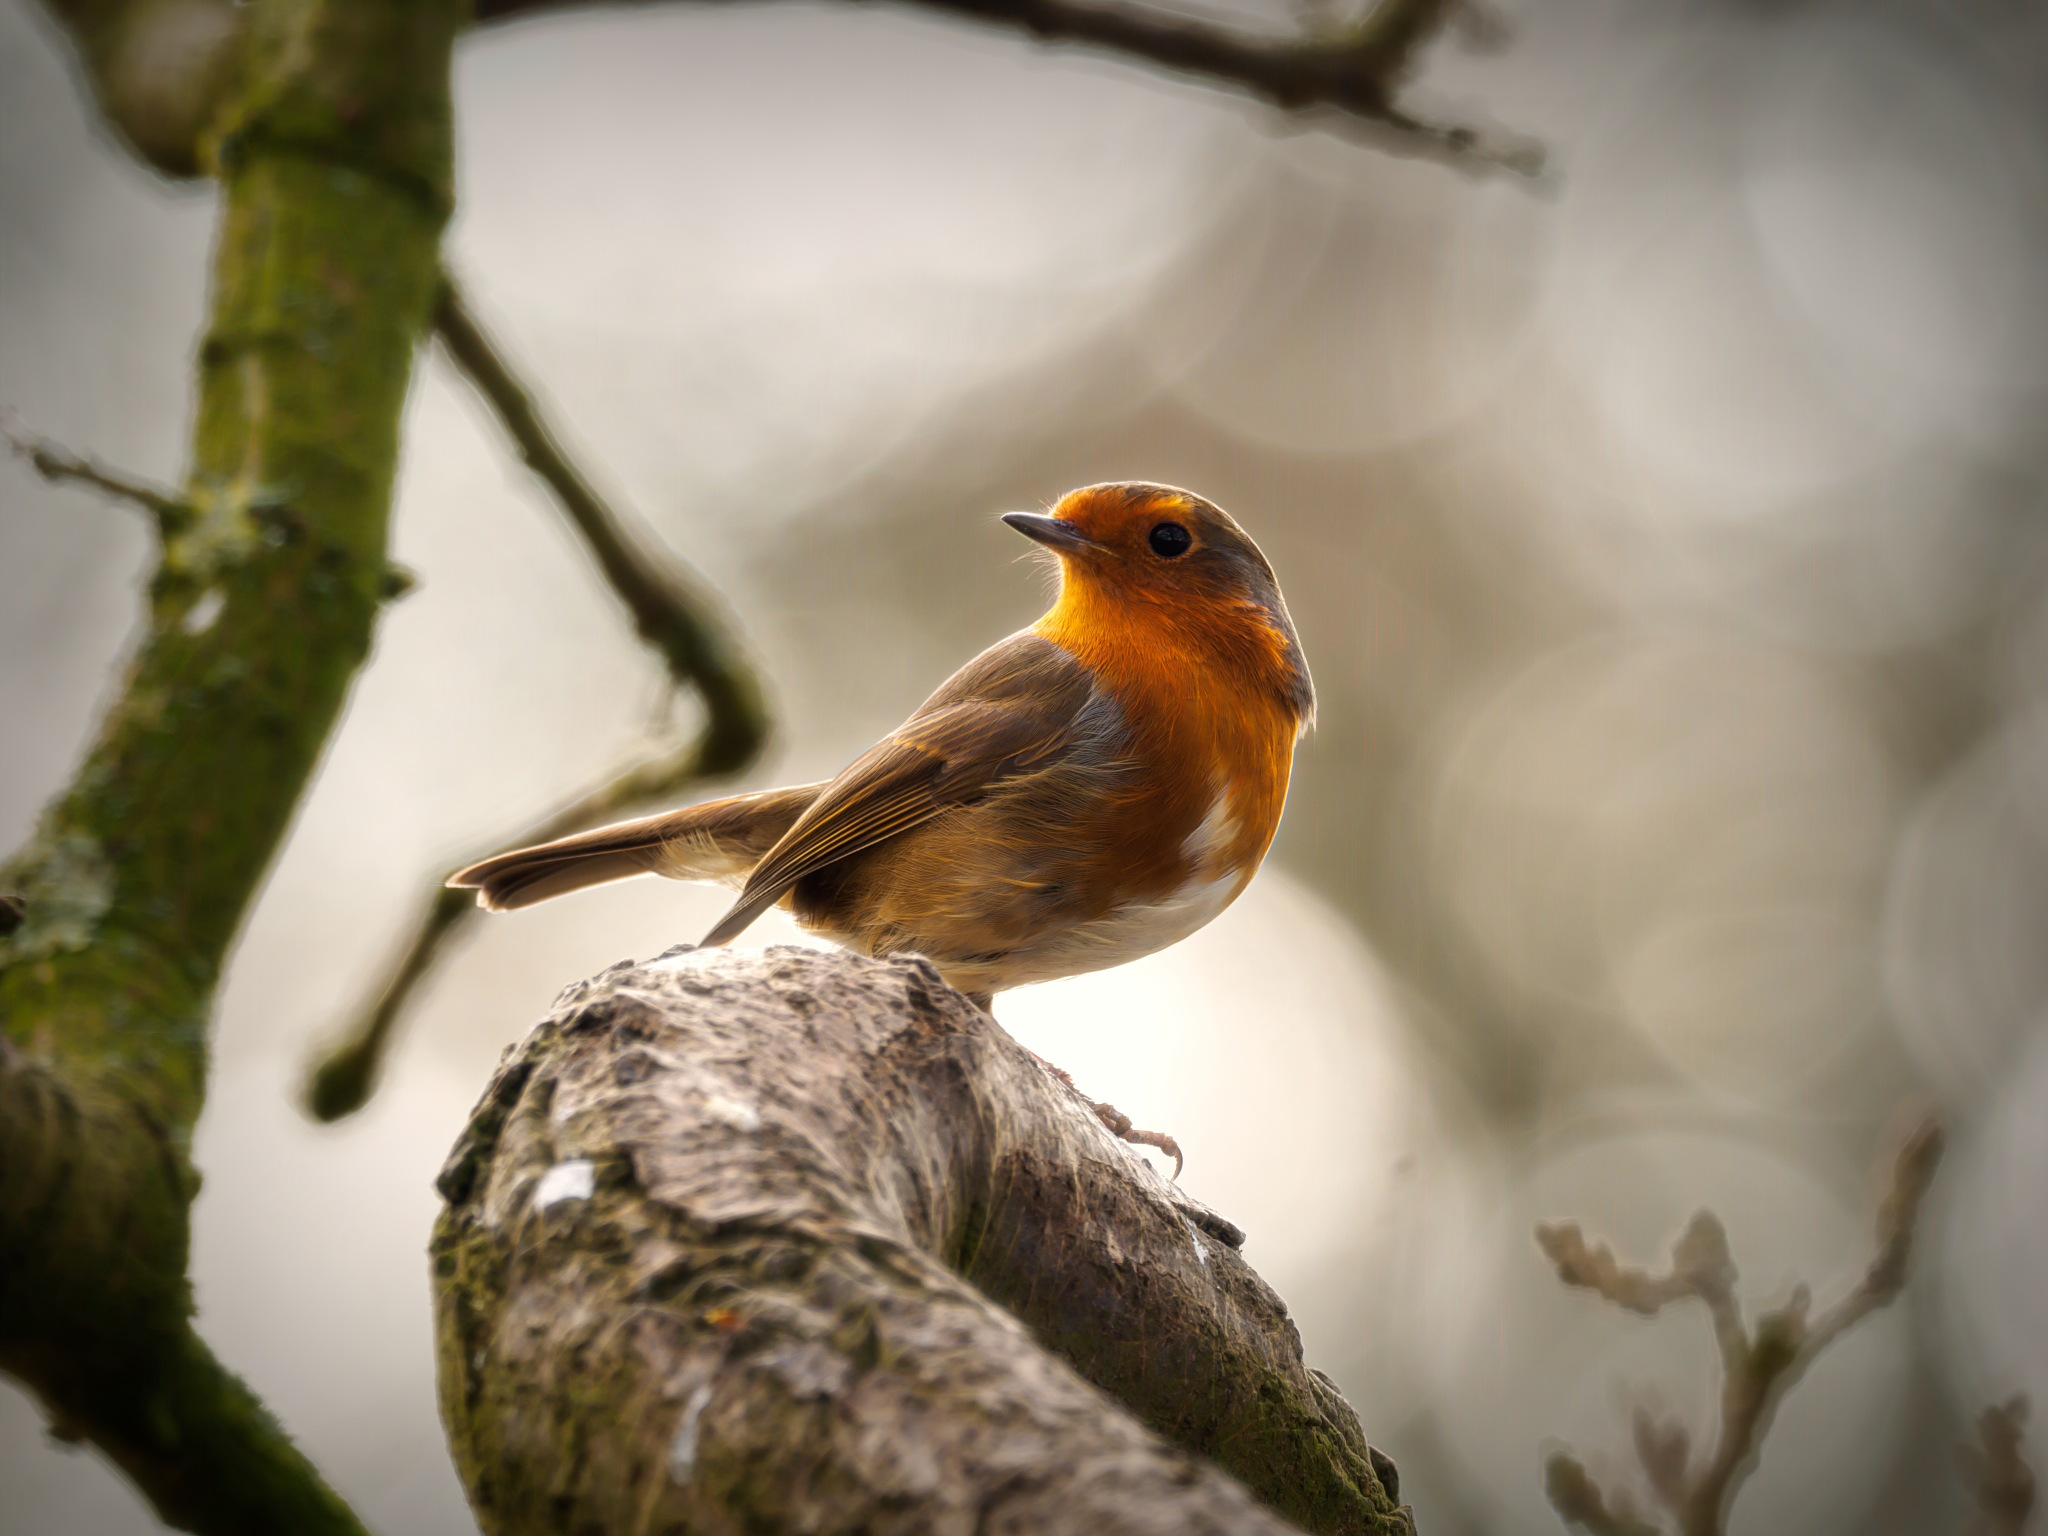 Robin 2 by Sarah Walters